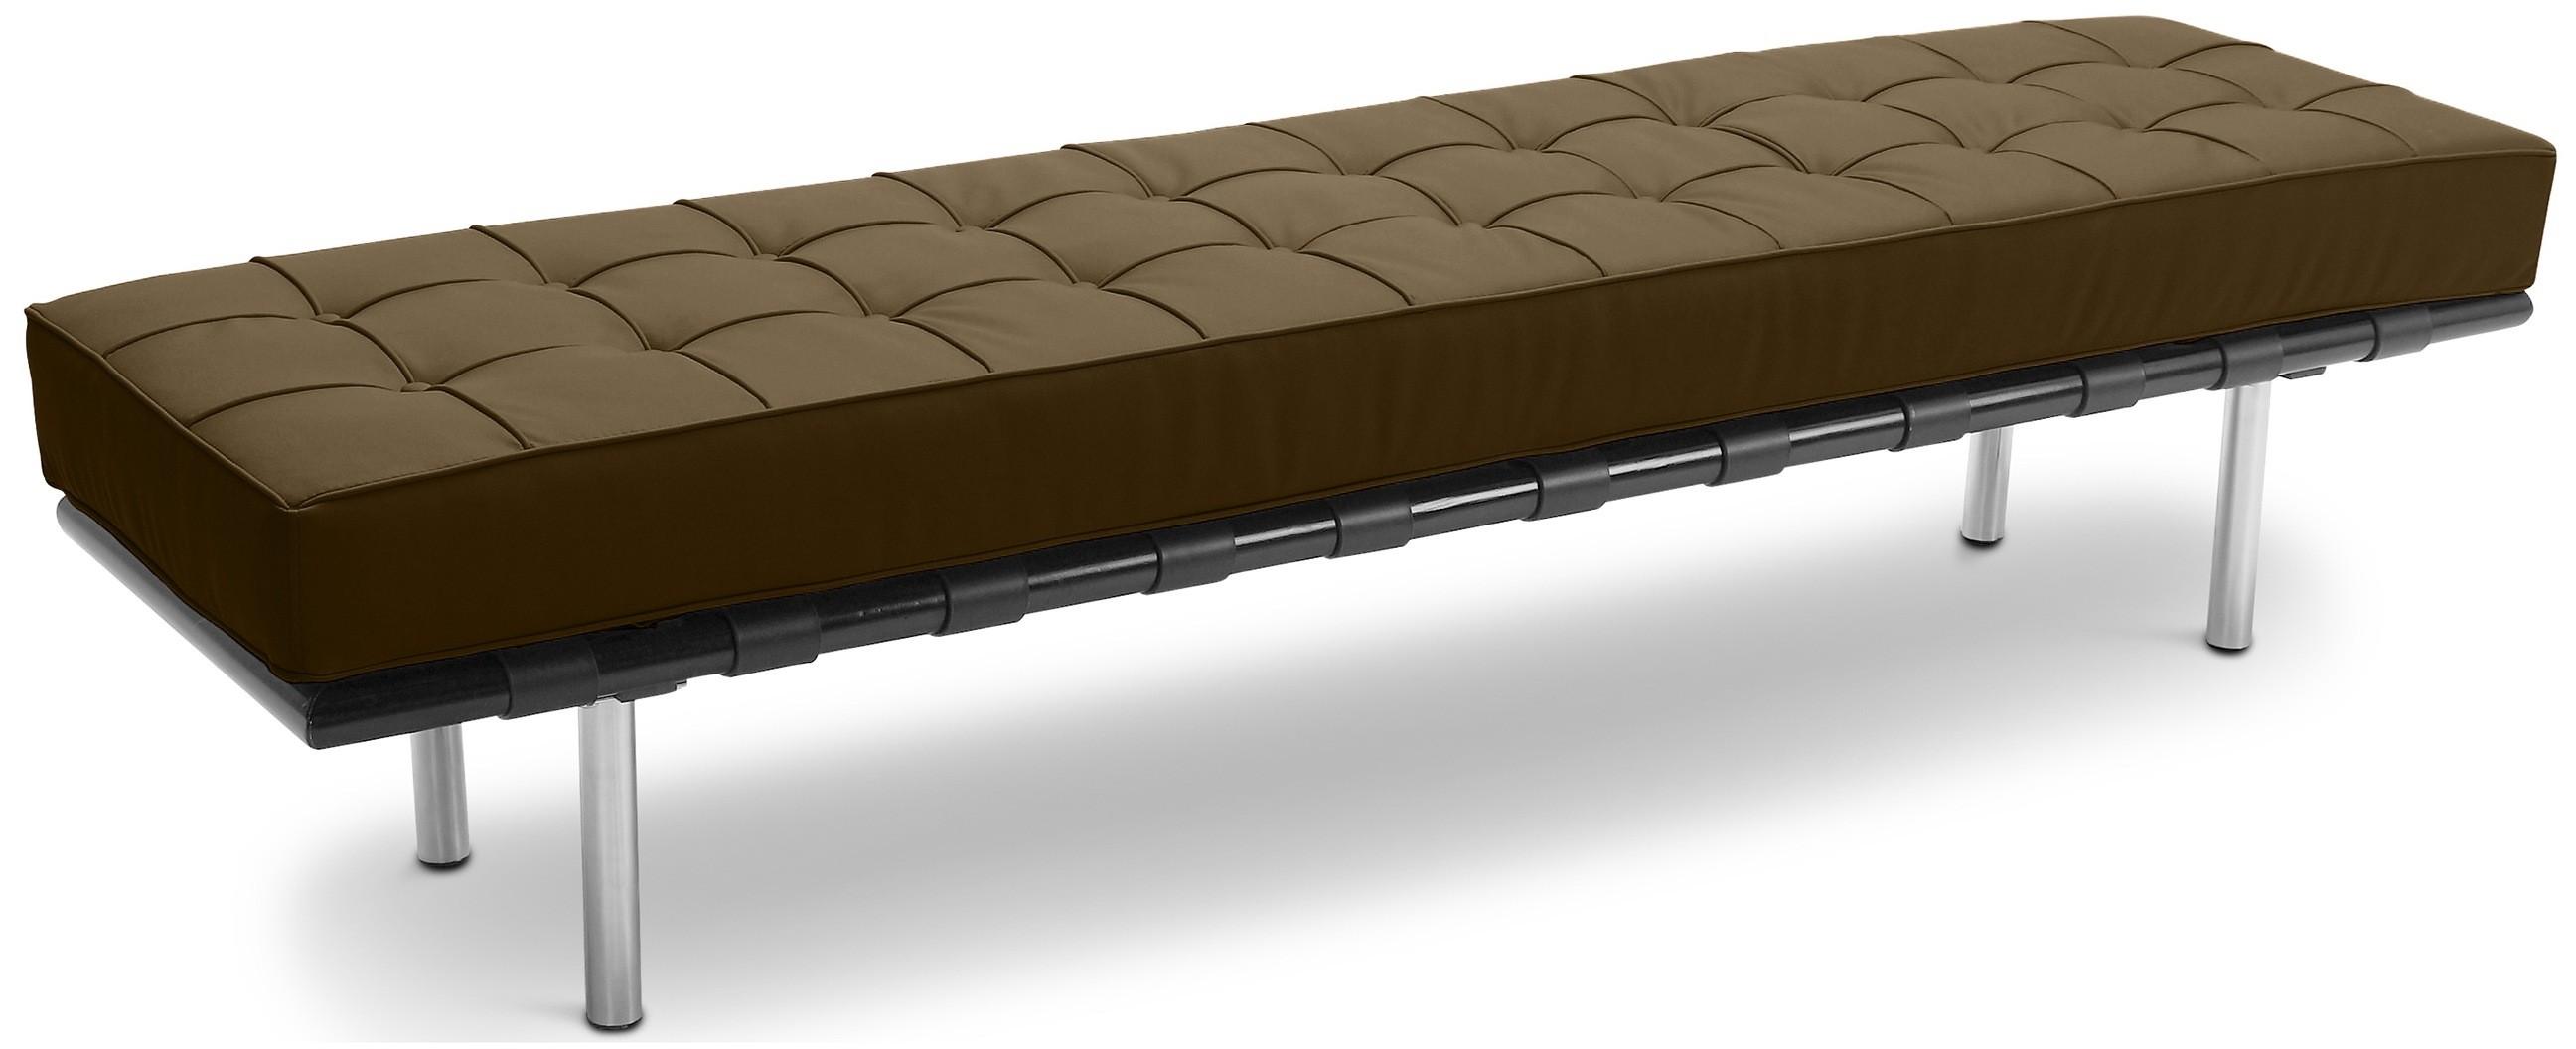 banc 3 places simili chocolat barca inspir ludwig mies van der rohe. Black Bedroom Furniture Sets. Home Design Ideas